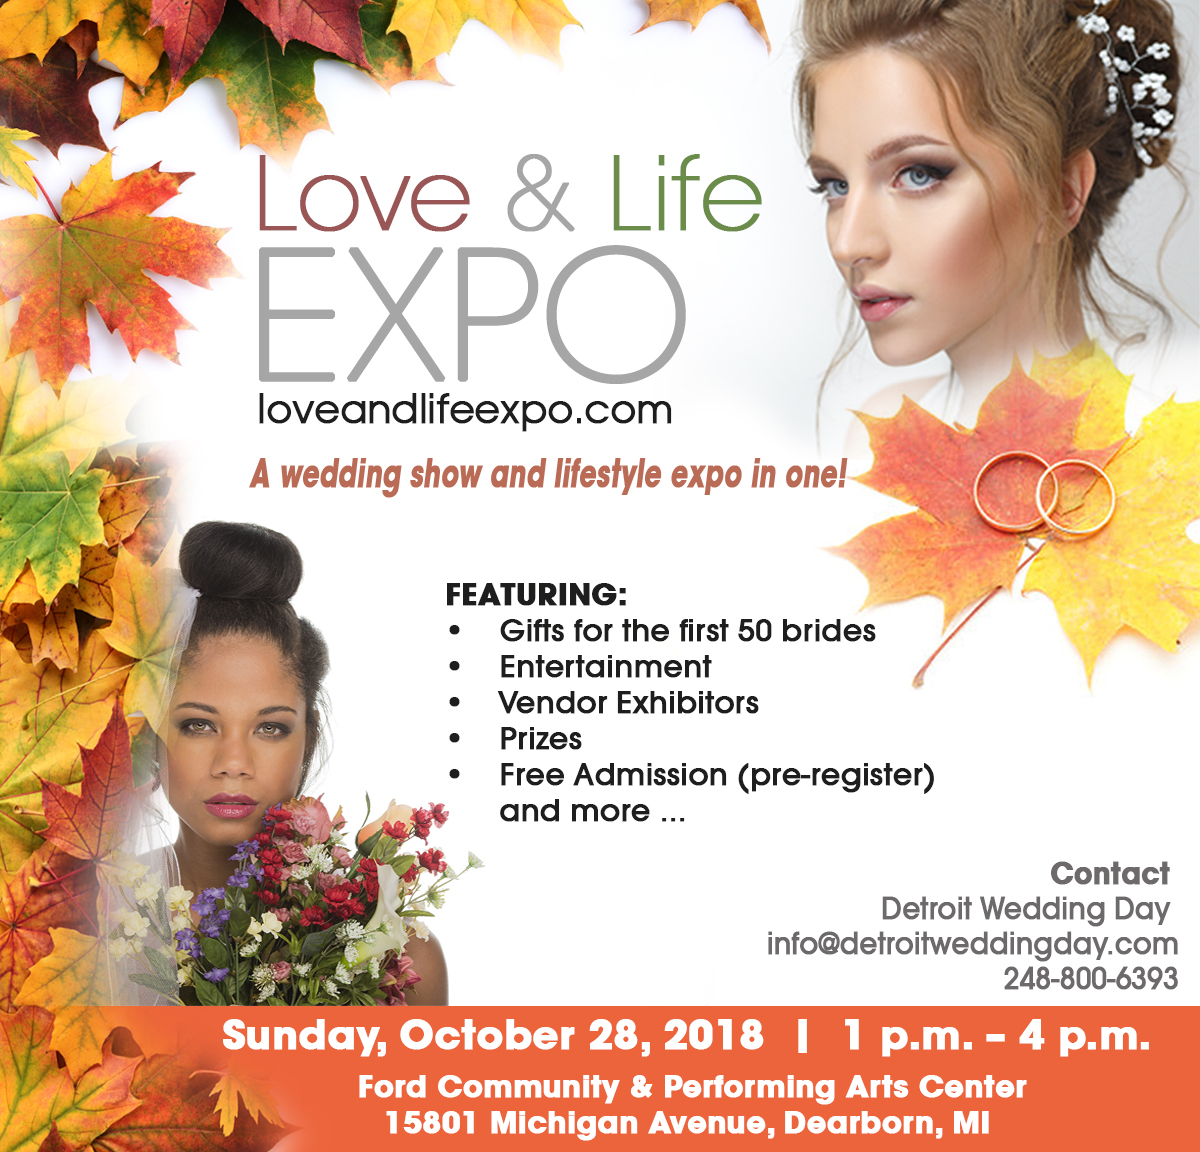 Love & Life Expo